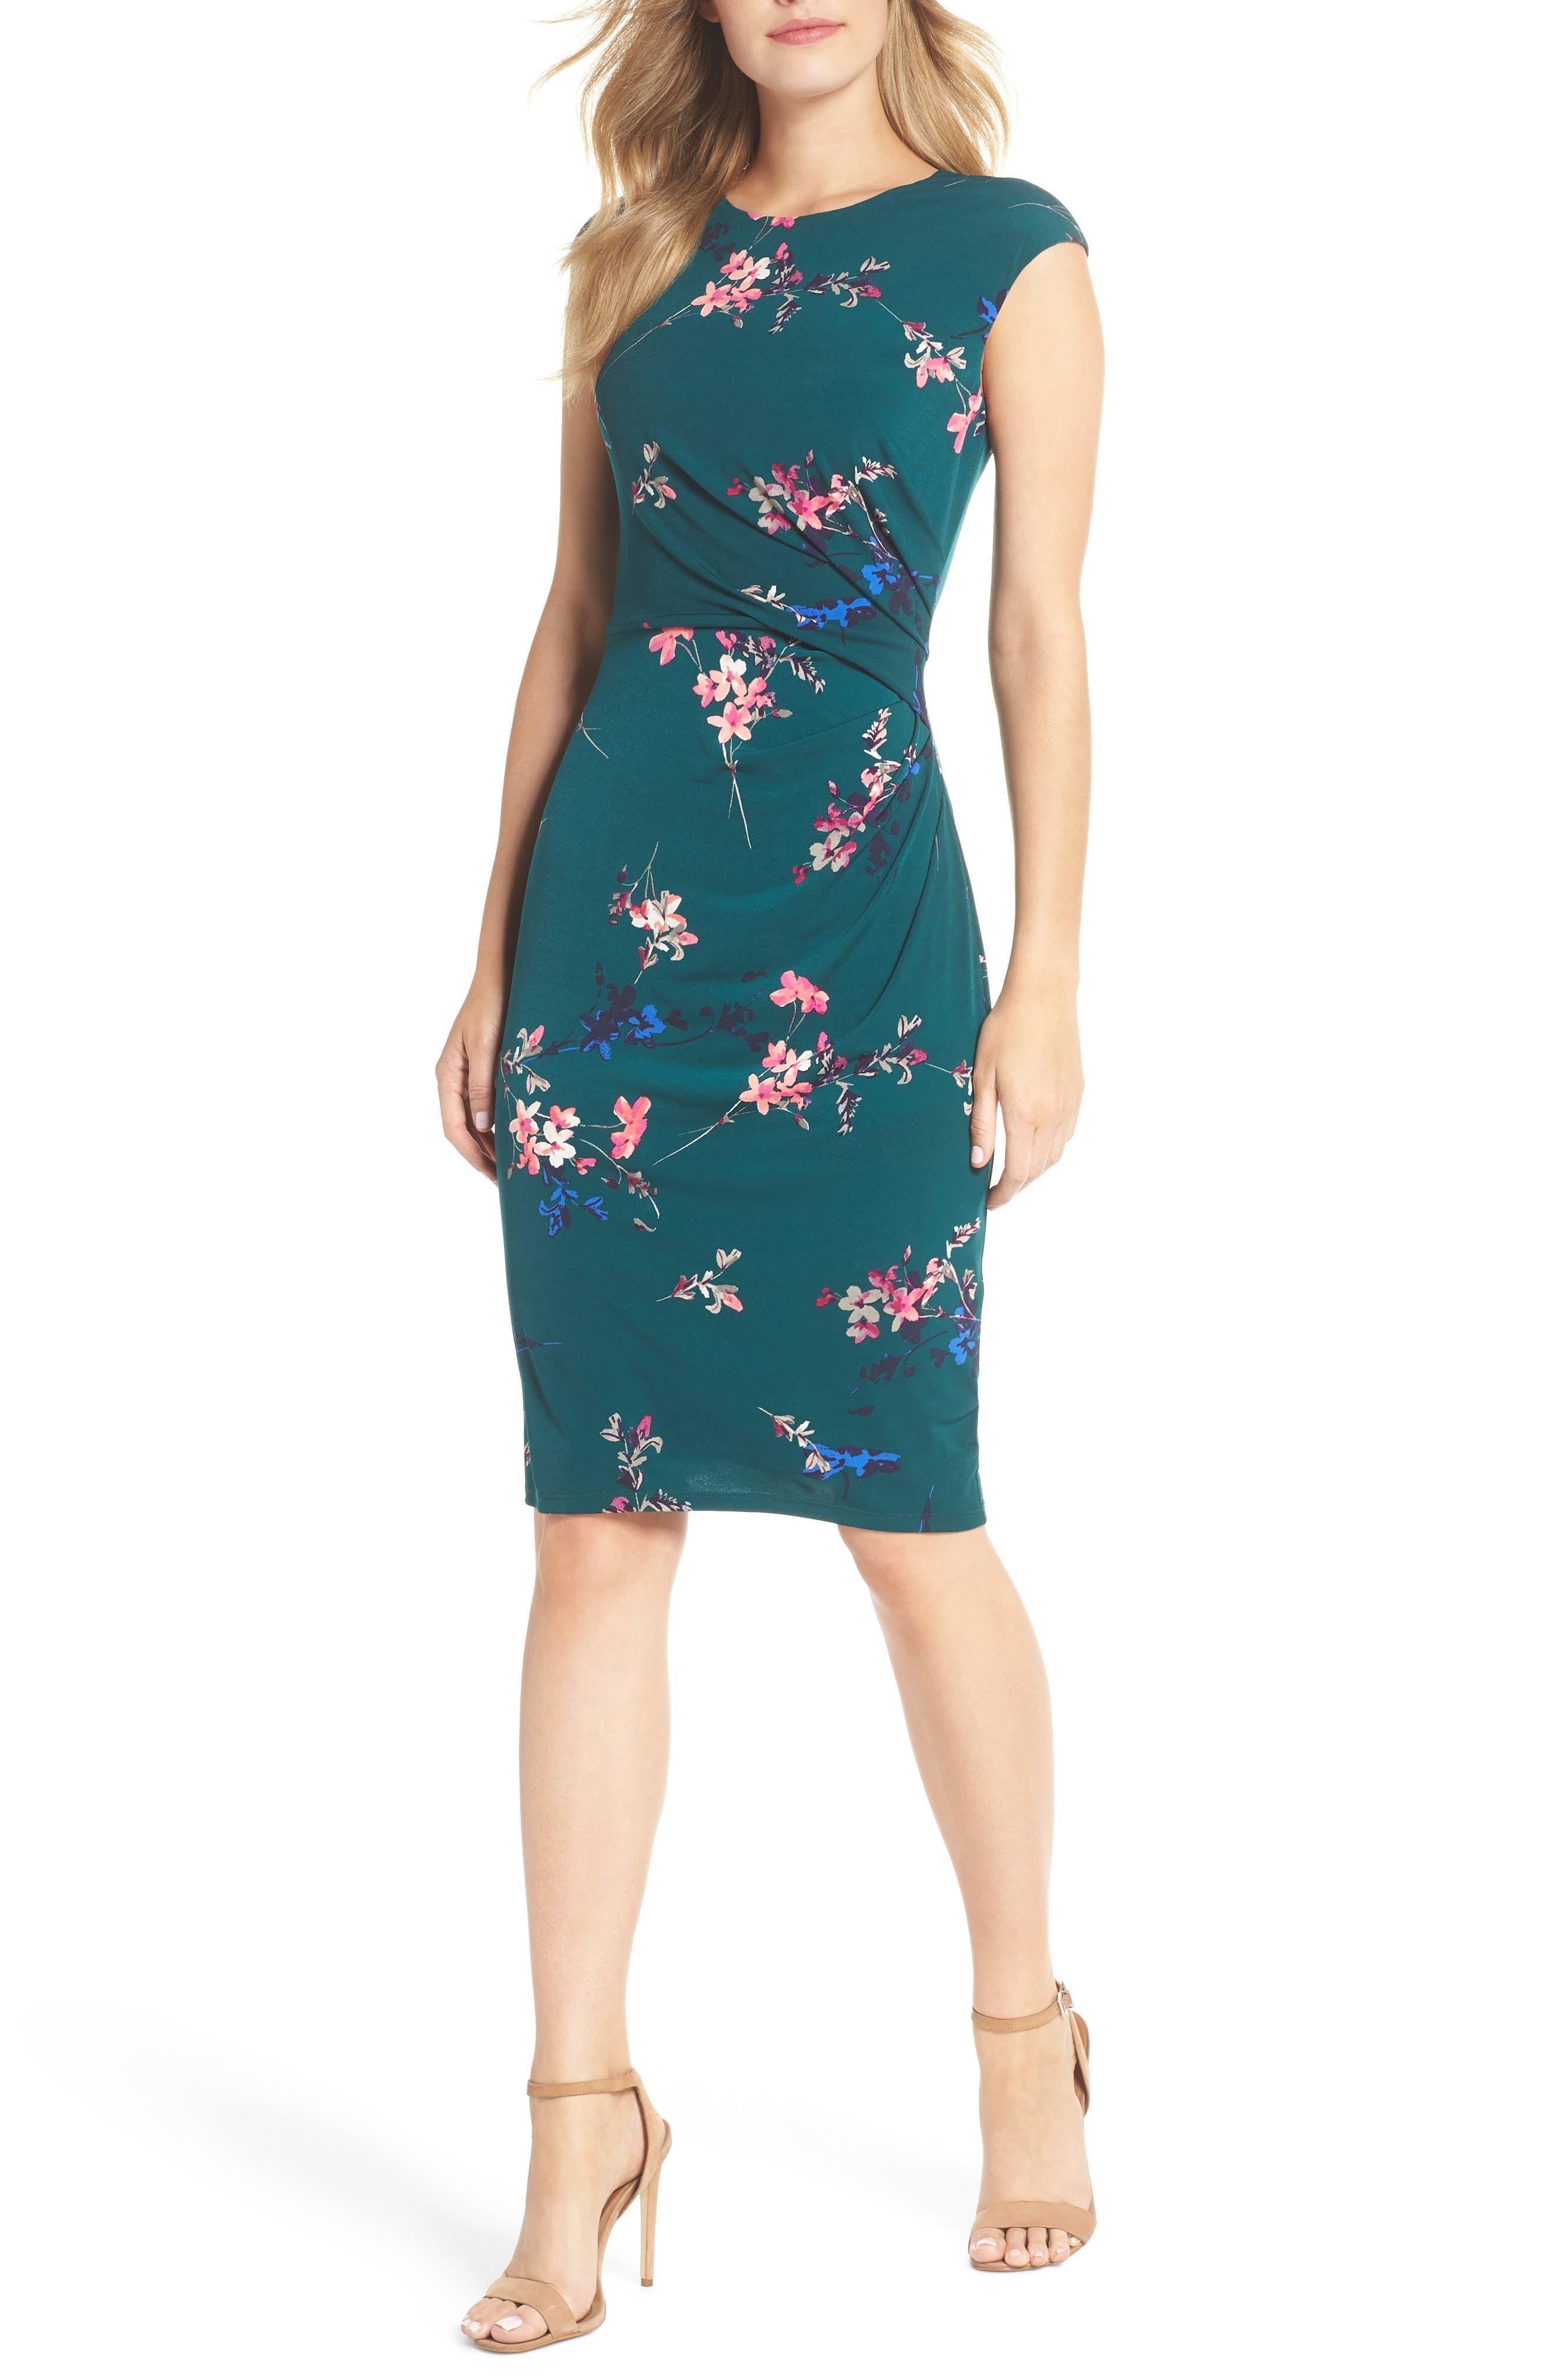 ELIZA J, Cap Sleeve Floral Print Sheath Dress, Main thumbnail 1, color, GREEN